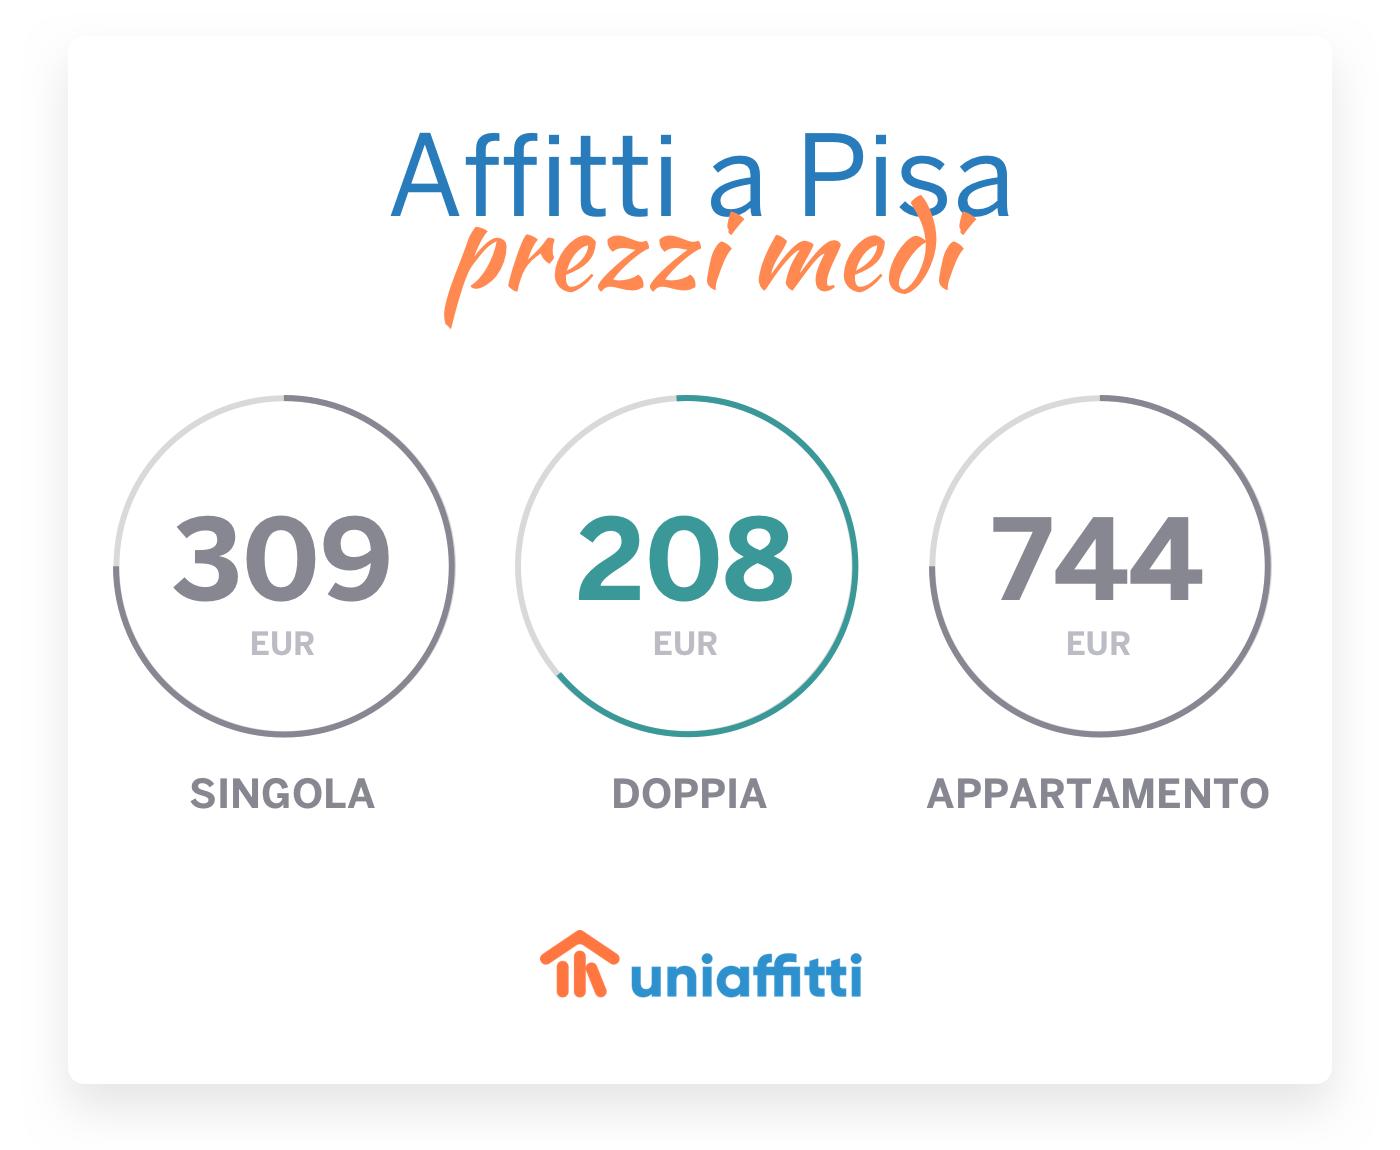 prezzi-medi-affitti-Pisa